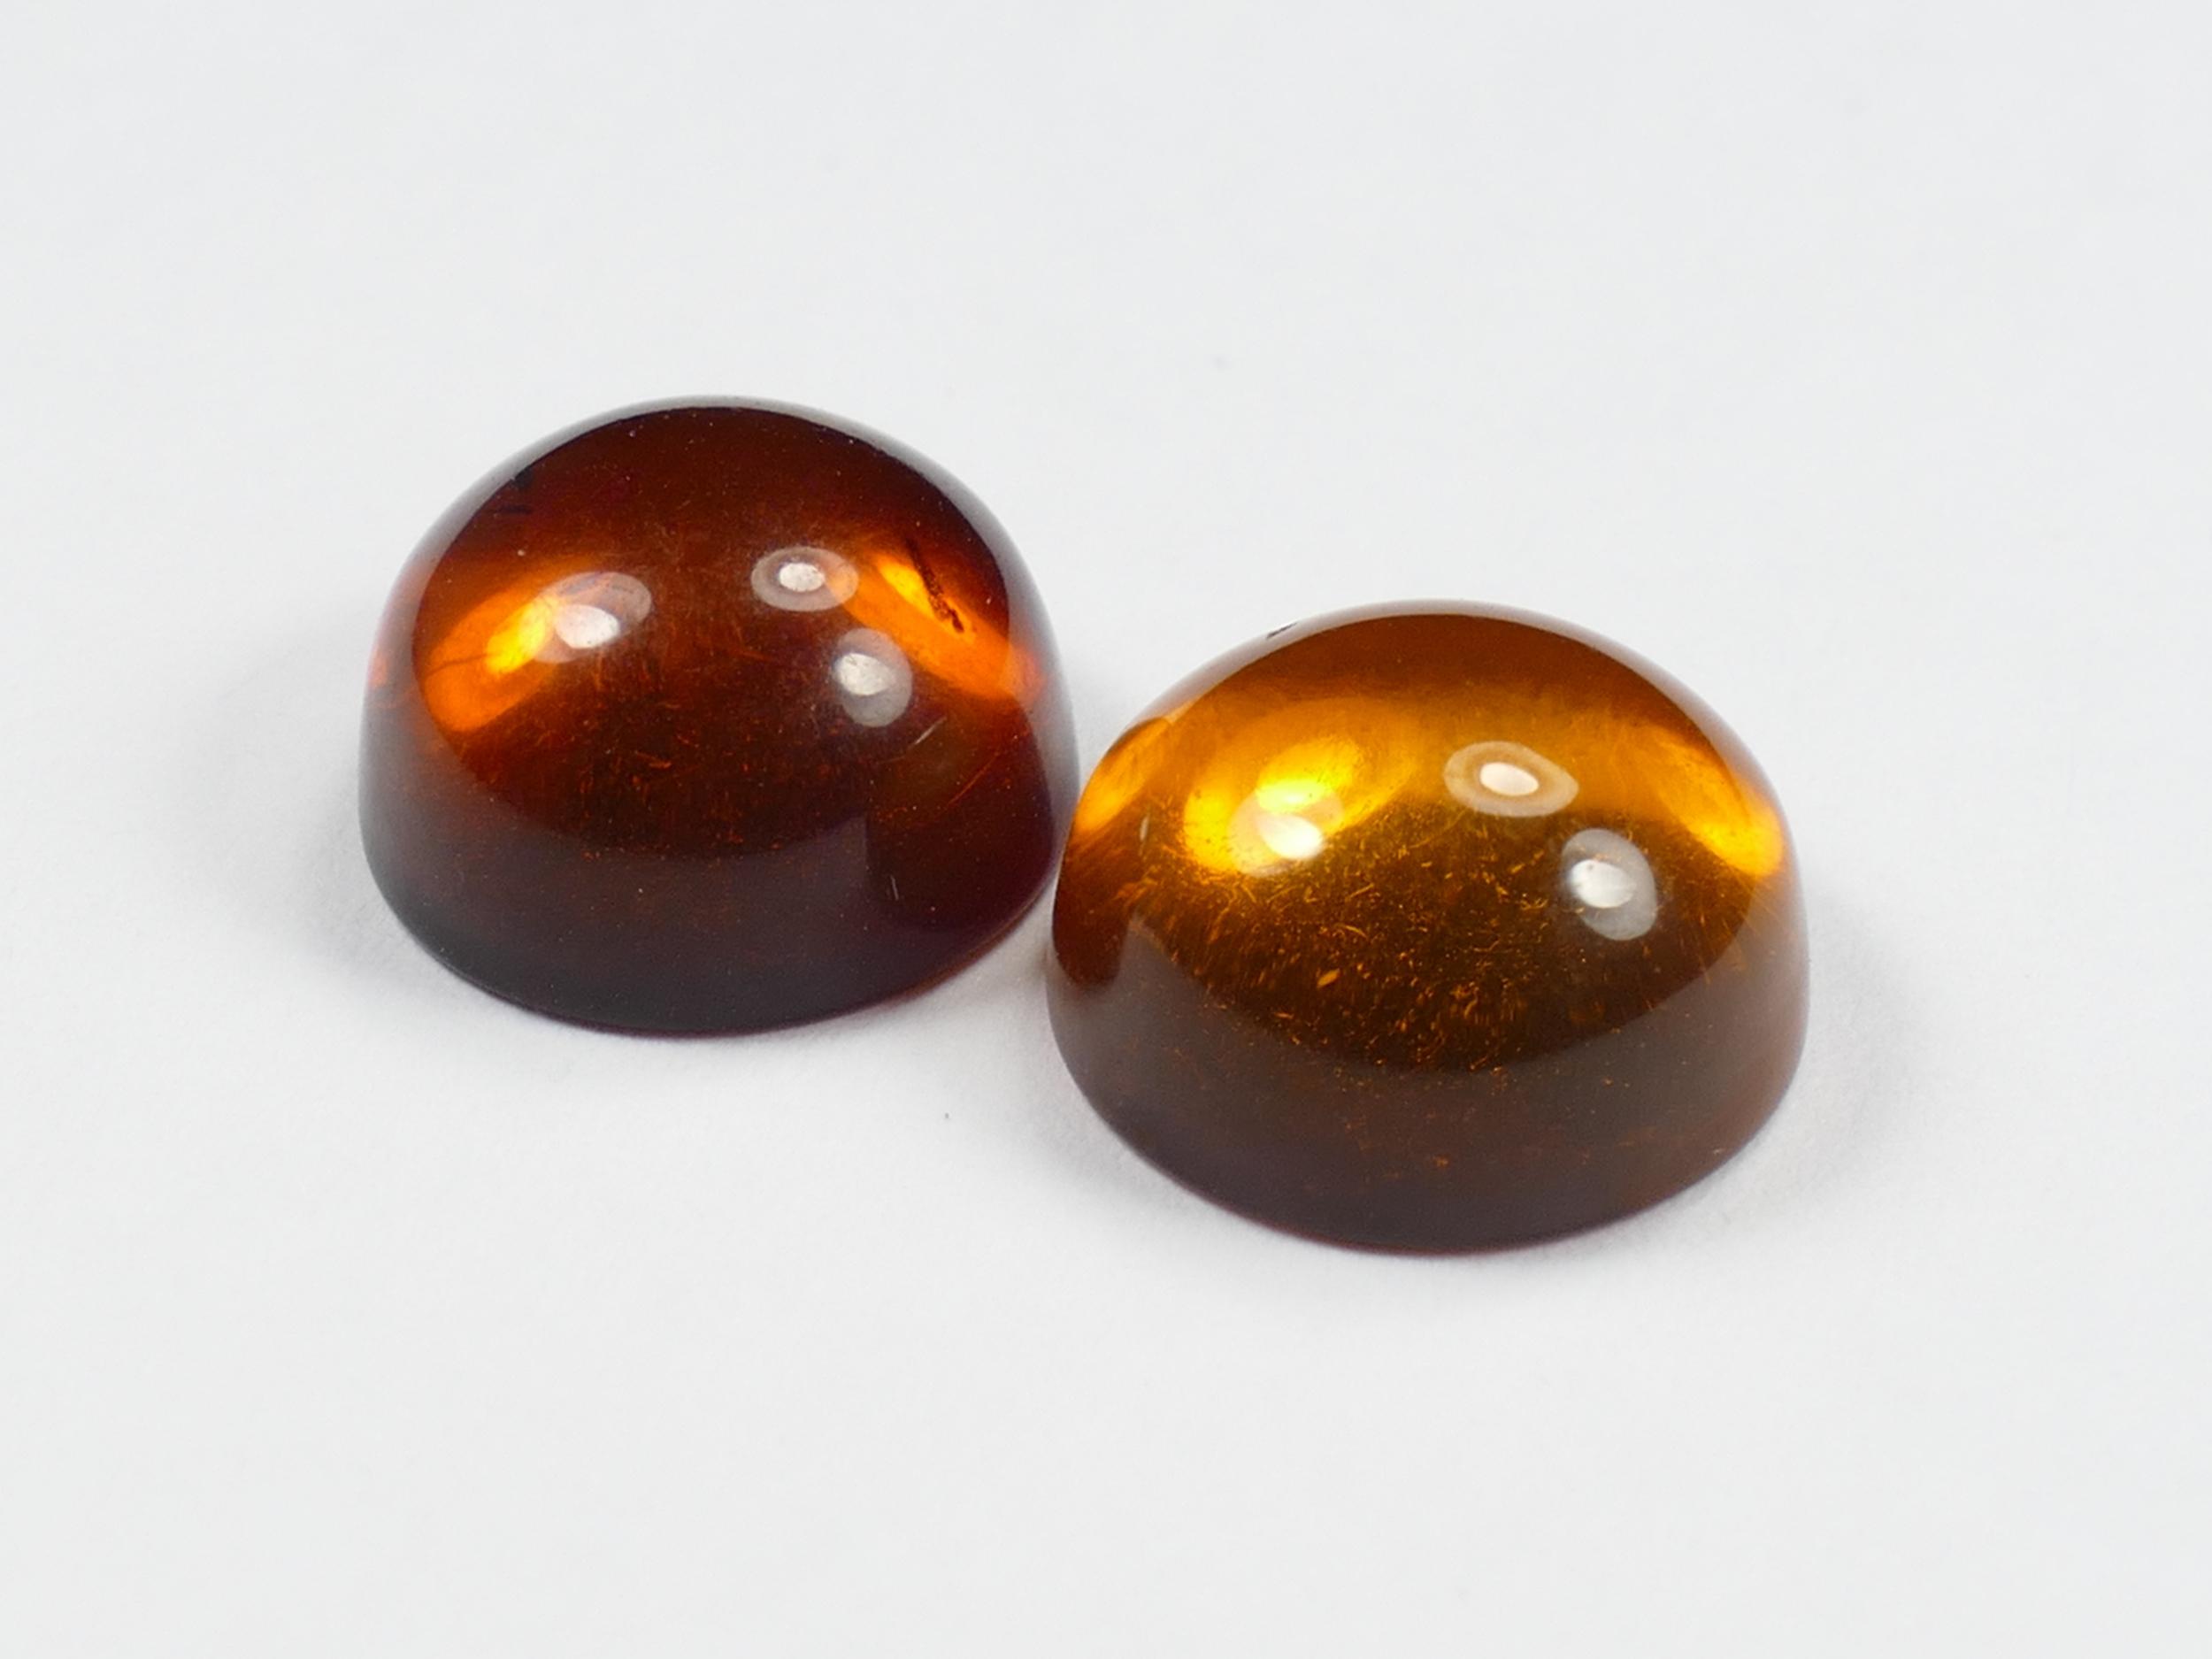 10.4mm Lot de 2 Ambre naturel natif de la Mer Baltique en cabochon rond orange rouge miel UV (#PK92)